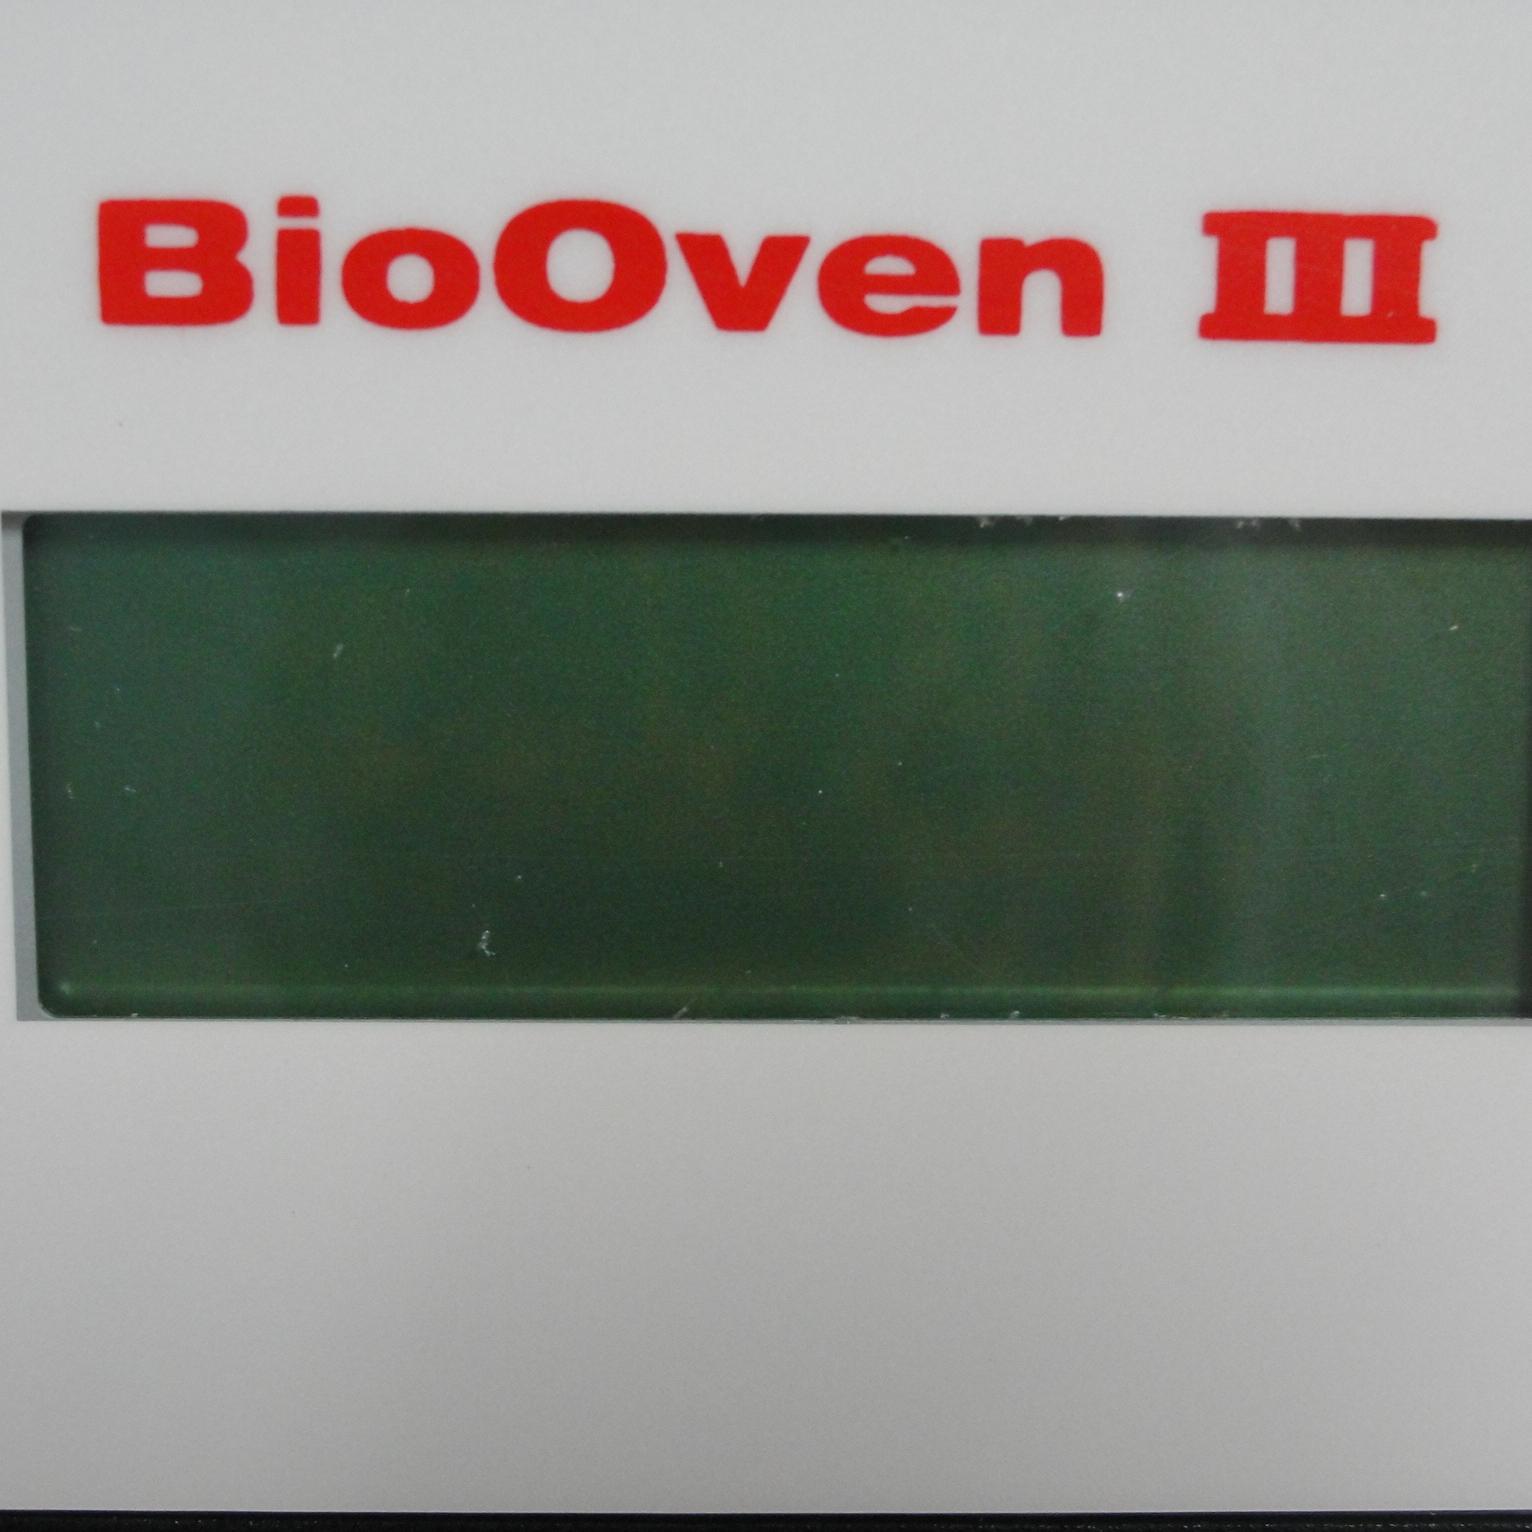 St John Associates - Bio Therm BioOven III Thermocycler Image